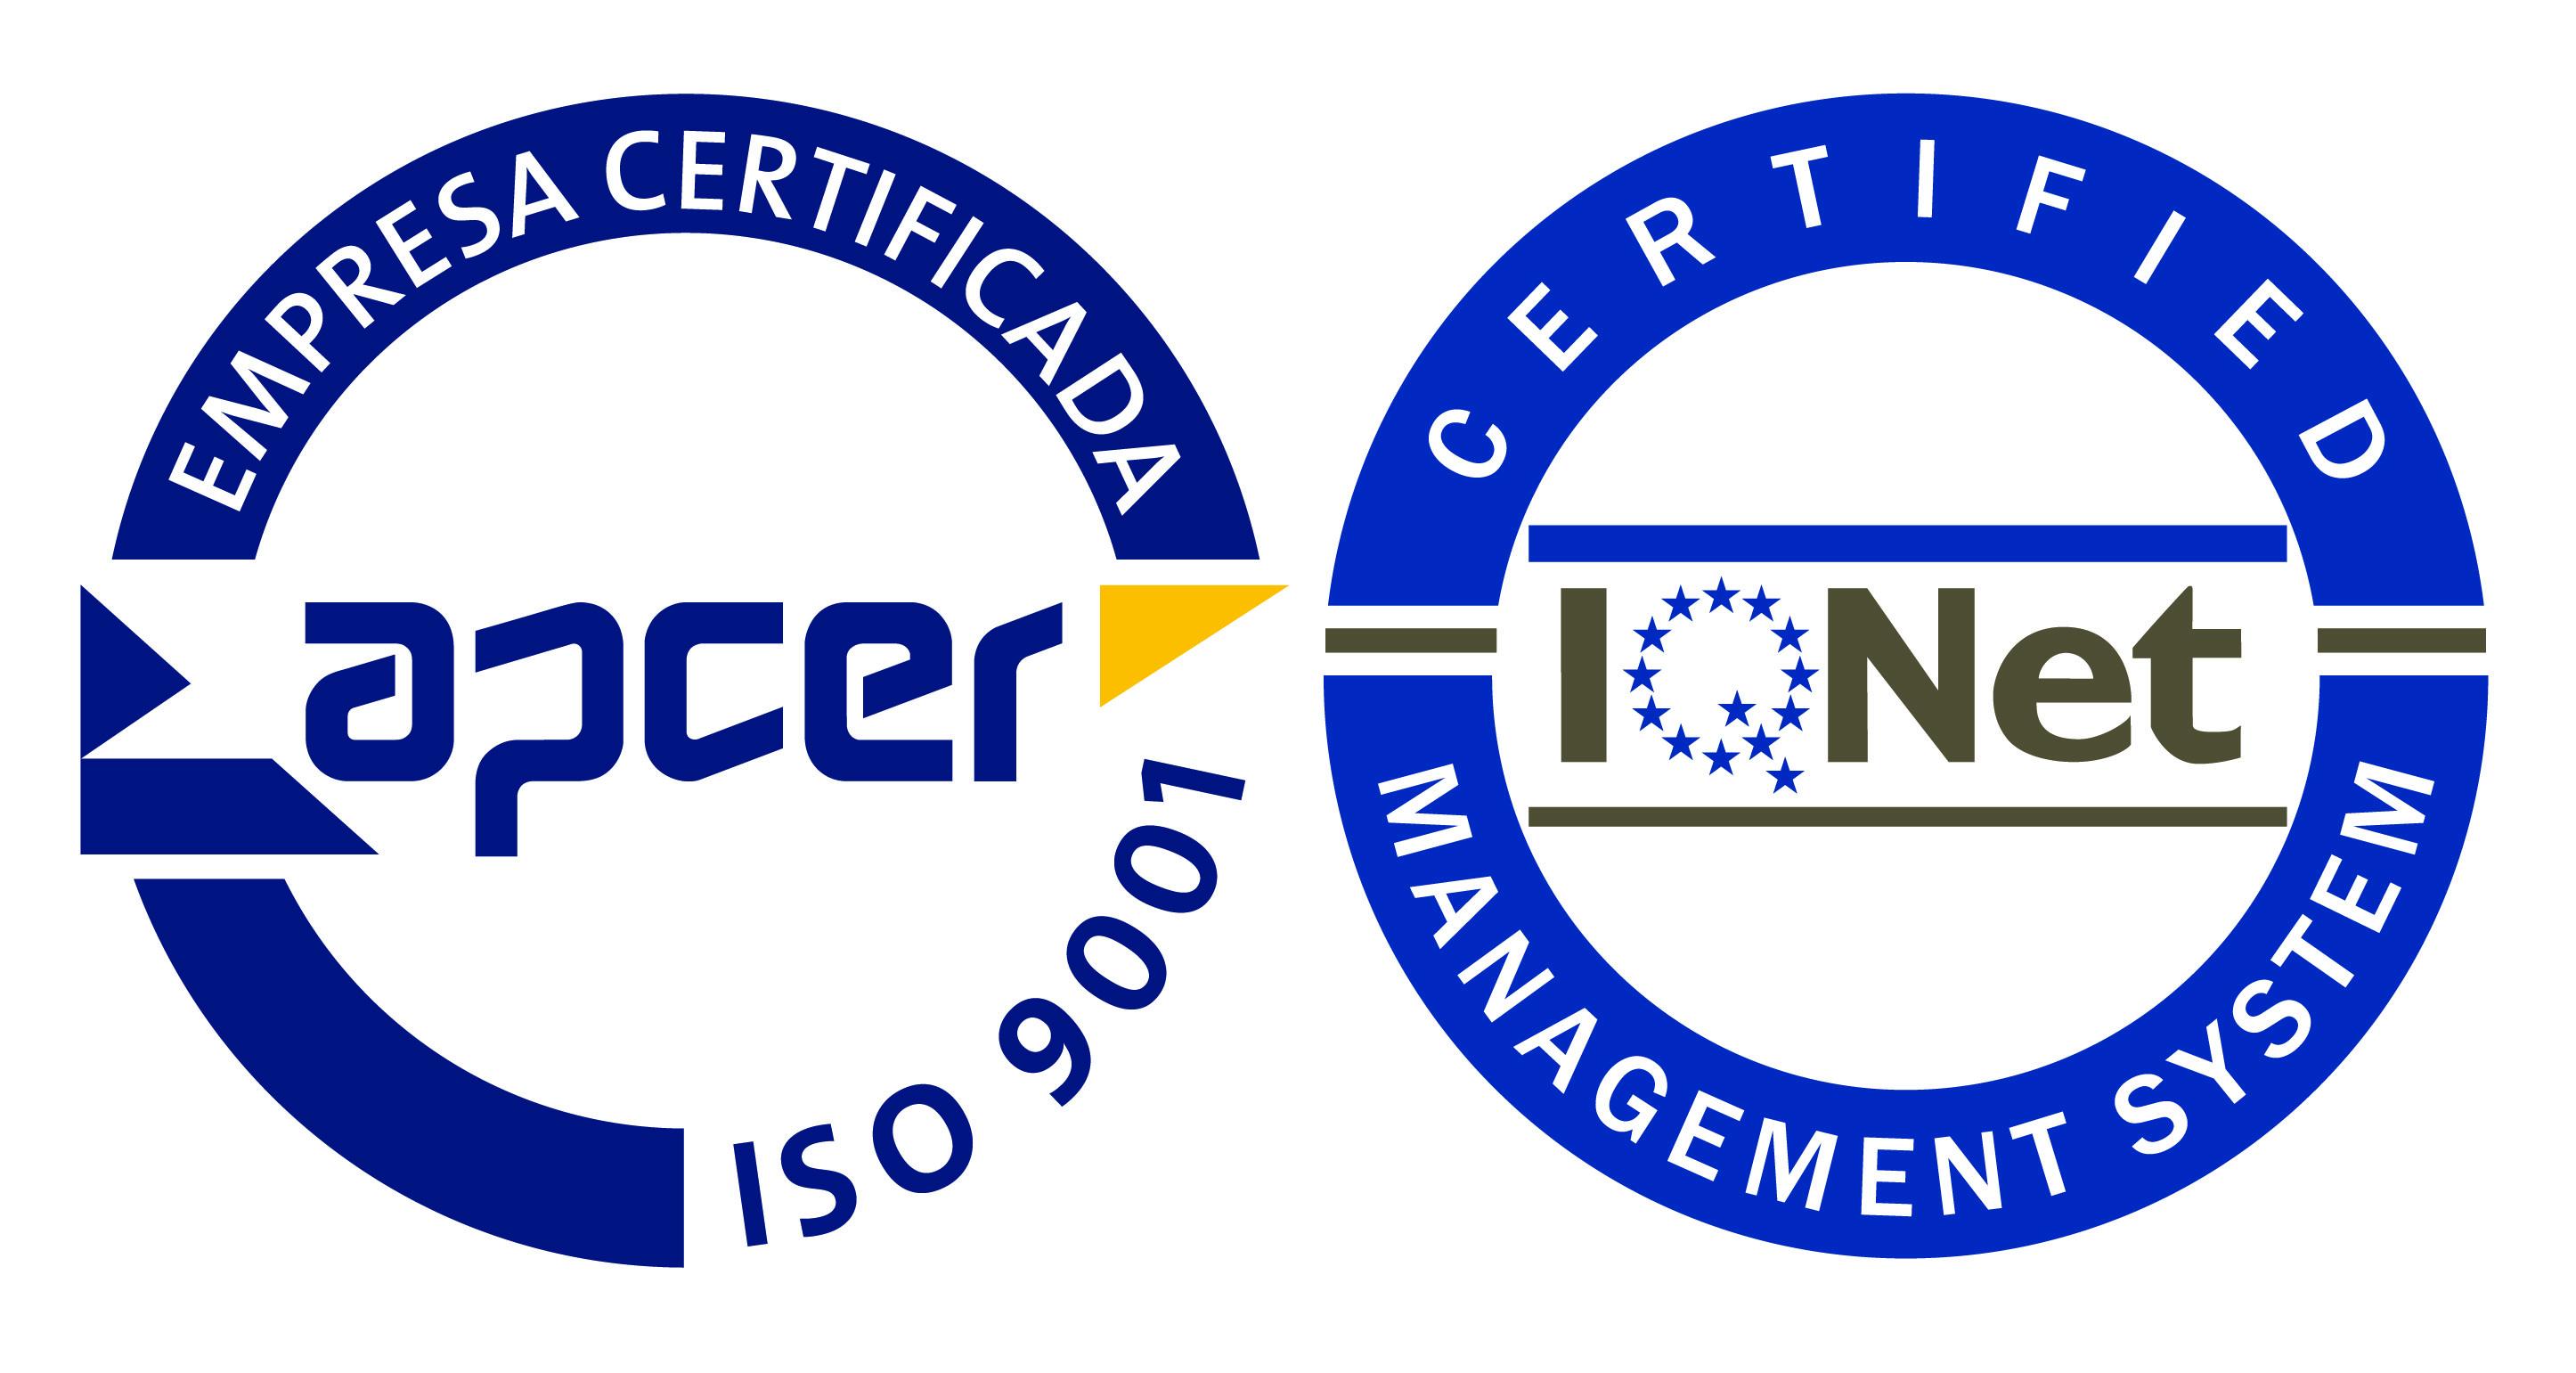 Certificação Np En Iso 9001:2008 - Apcer, Transparent background PNG HD thumbnail